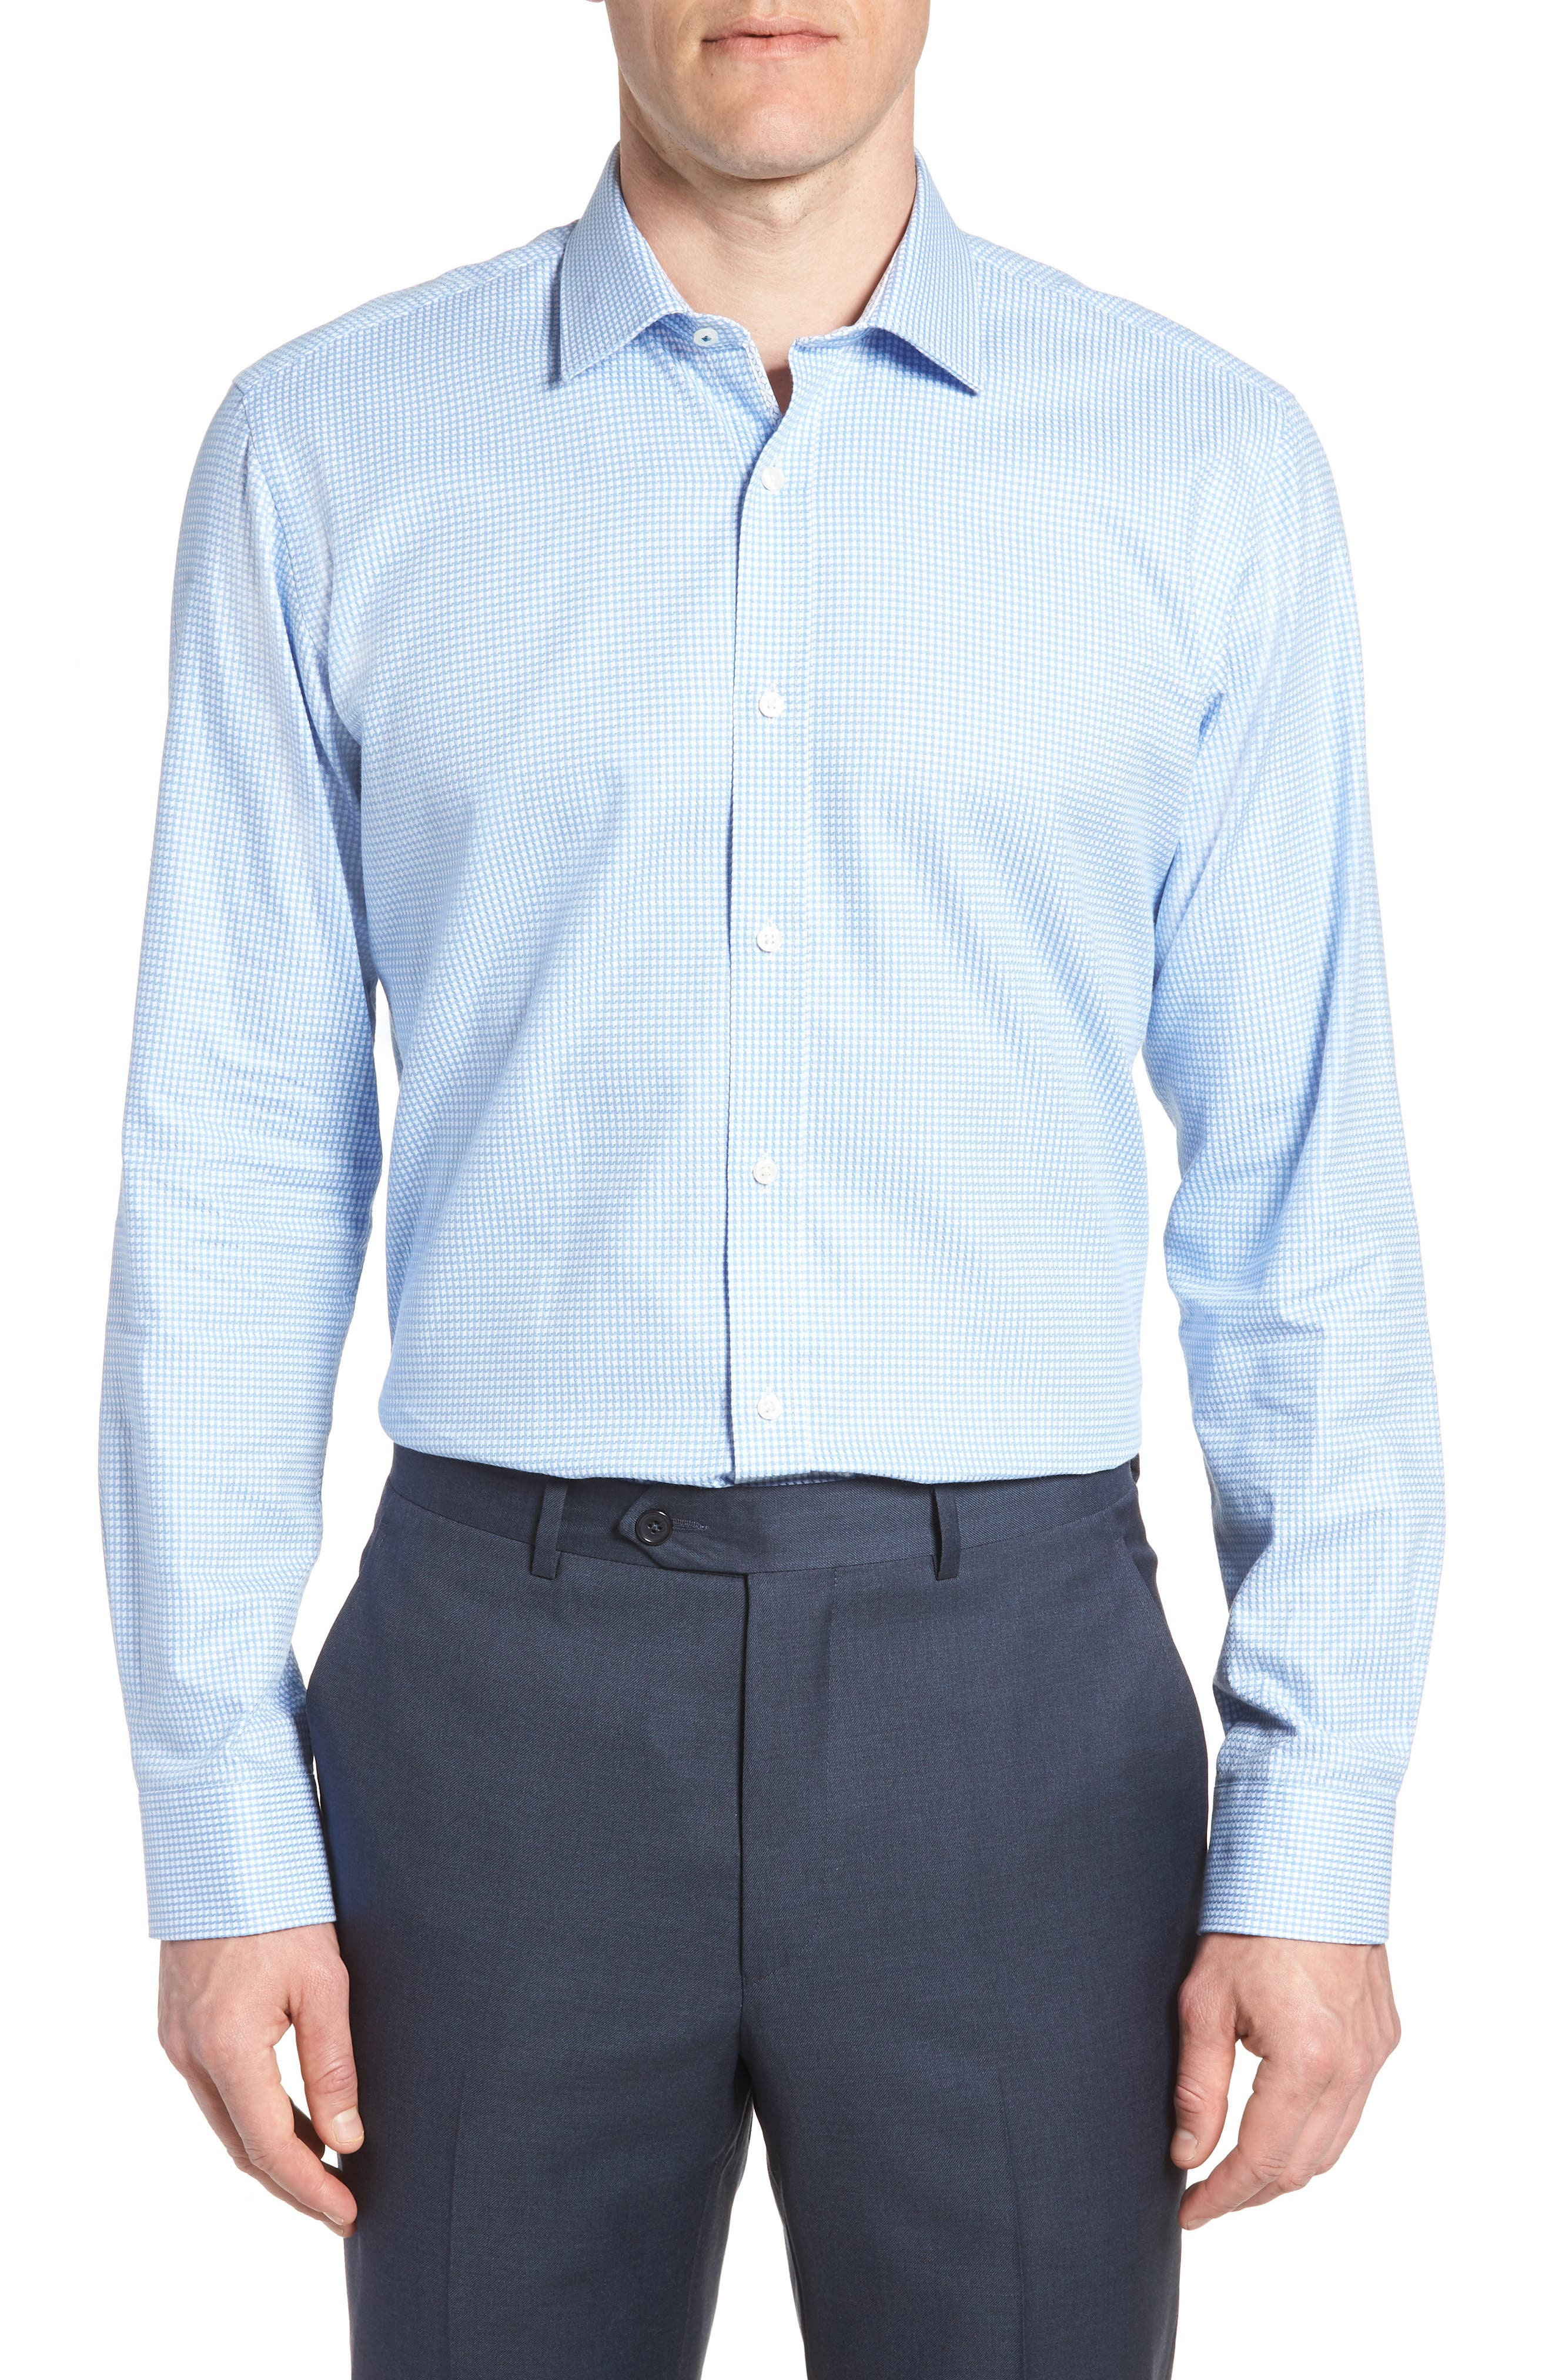 Jaiden Trim Fit Houndstooth Dress Shirt,                         Main,                         color, Light Blue